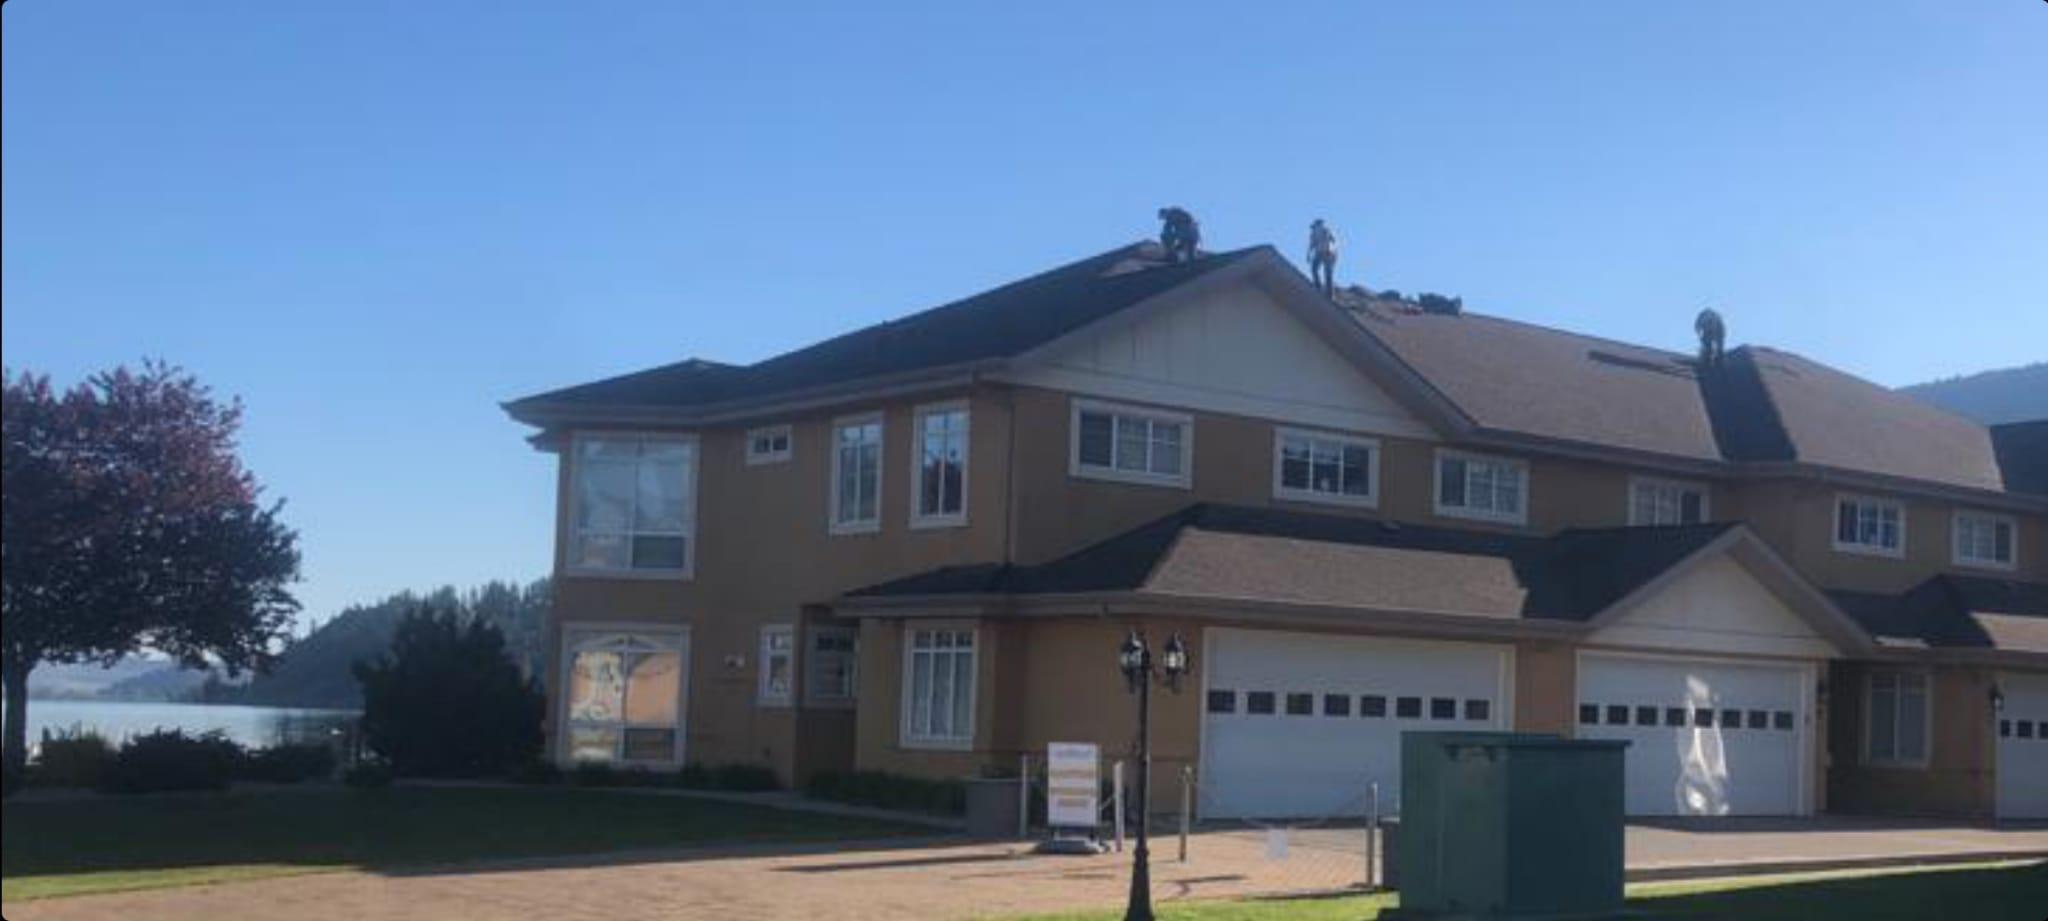 New Roofing Job Lake Country of the Okanagan